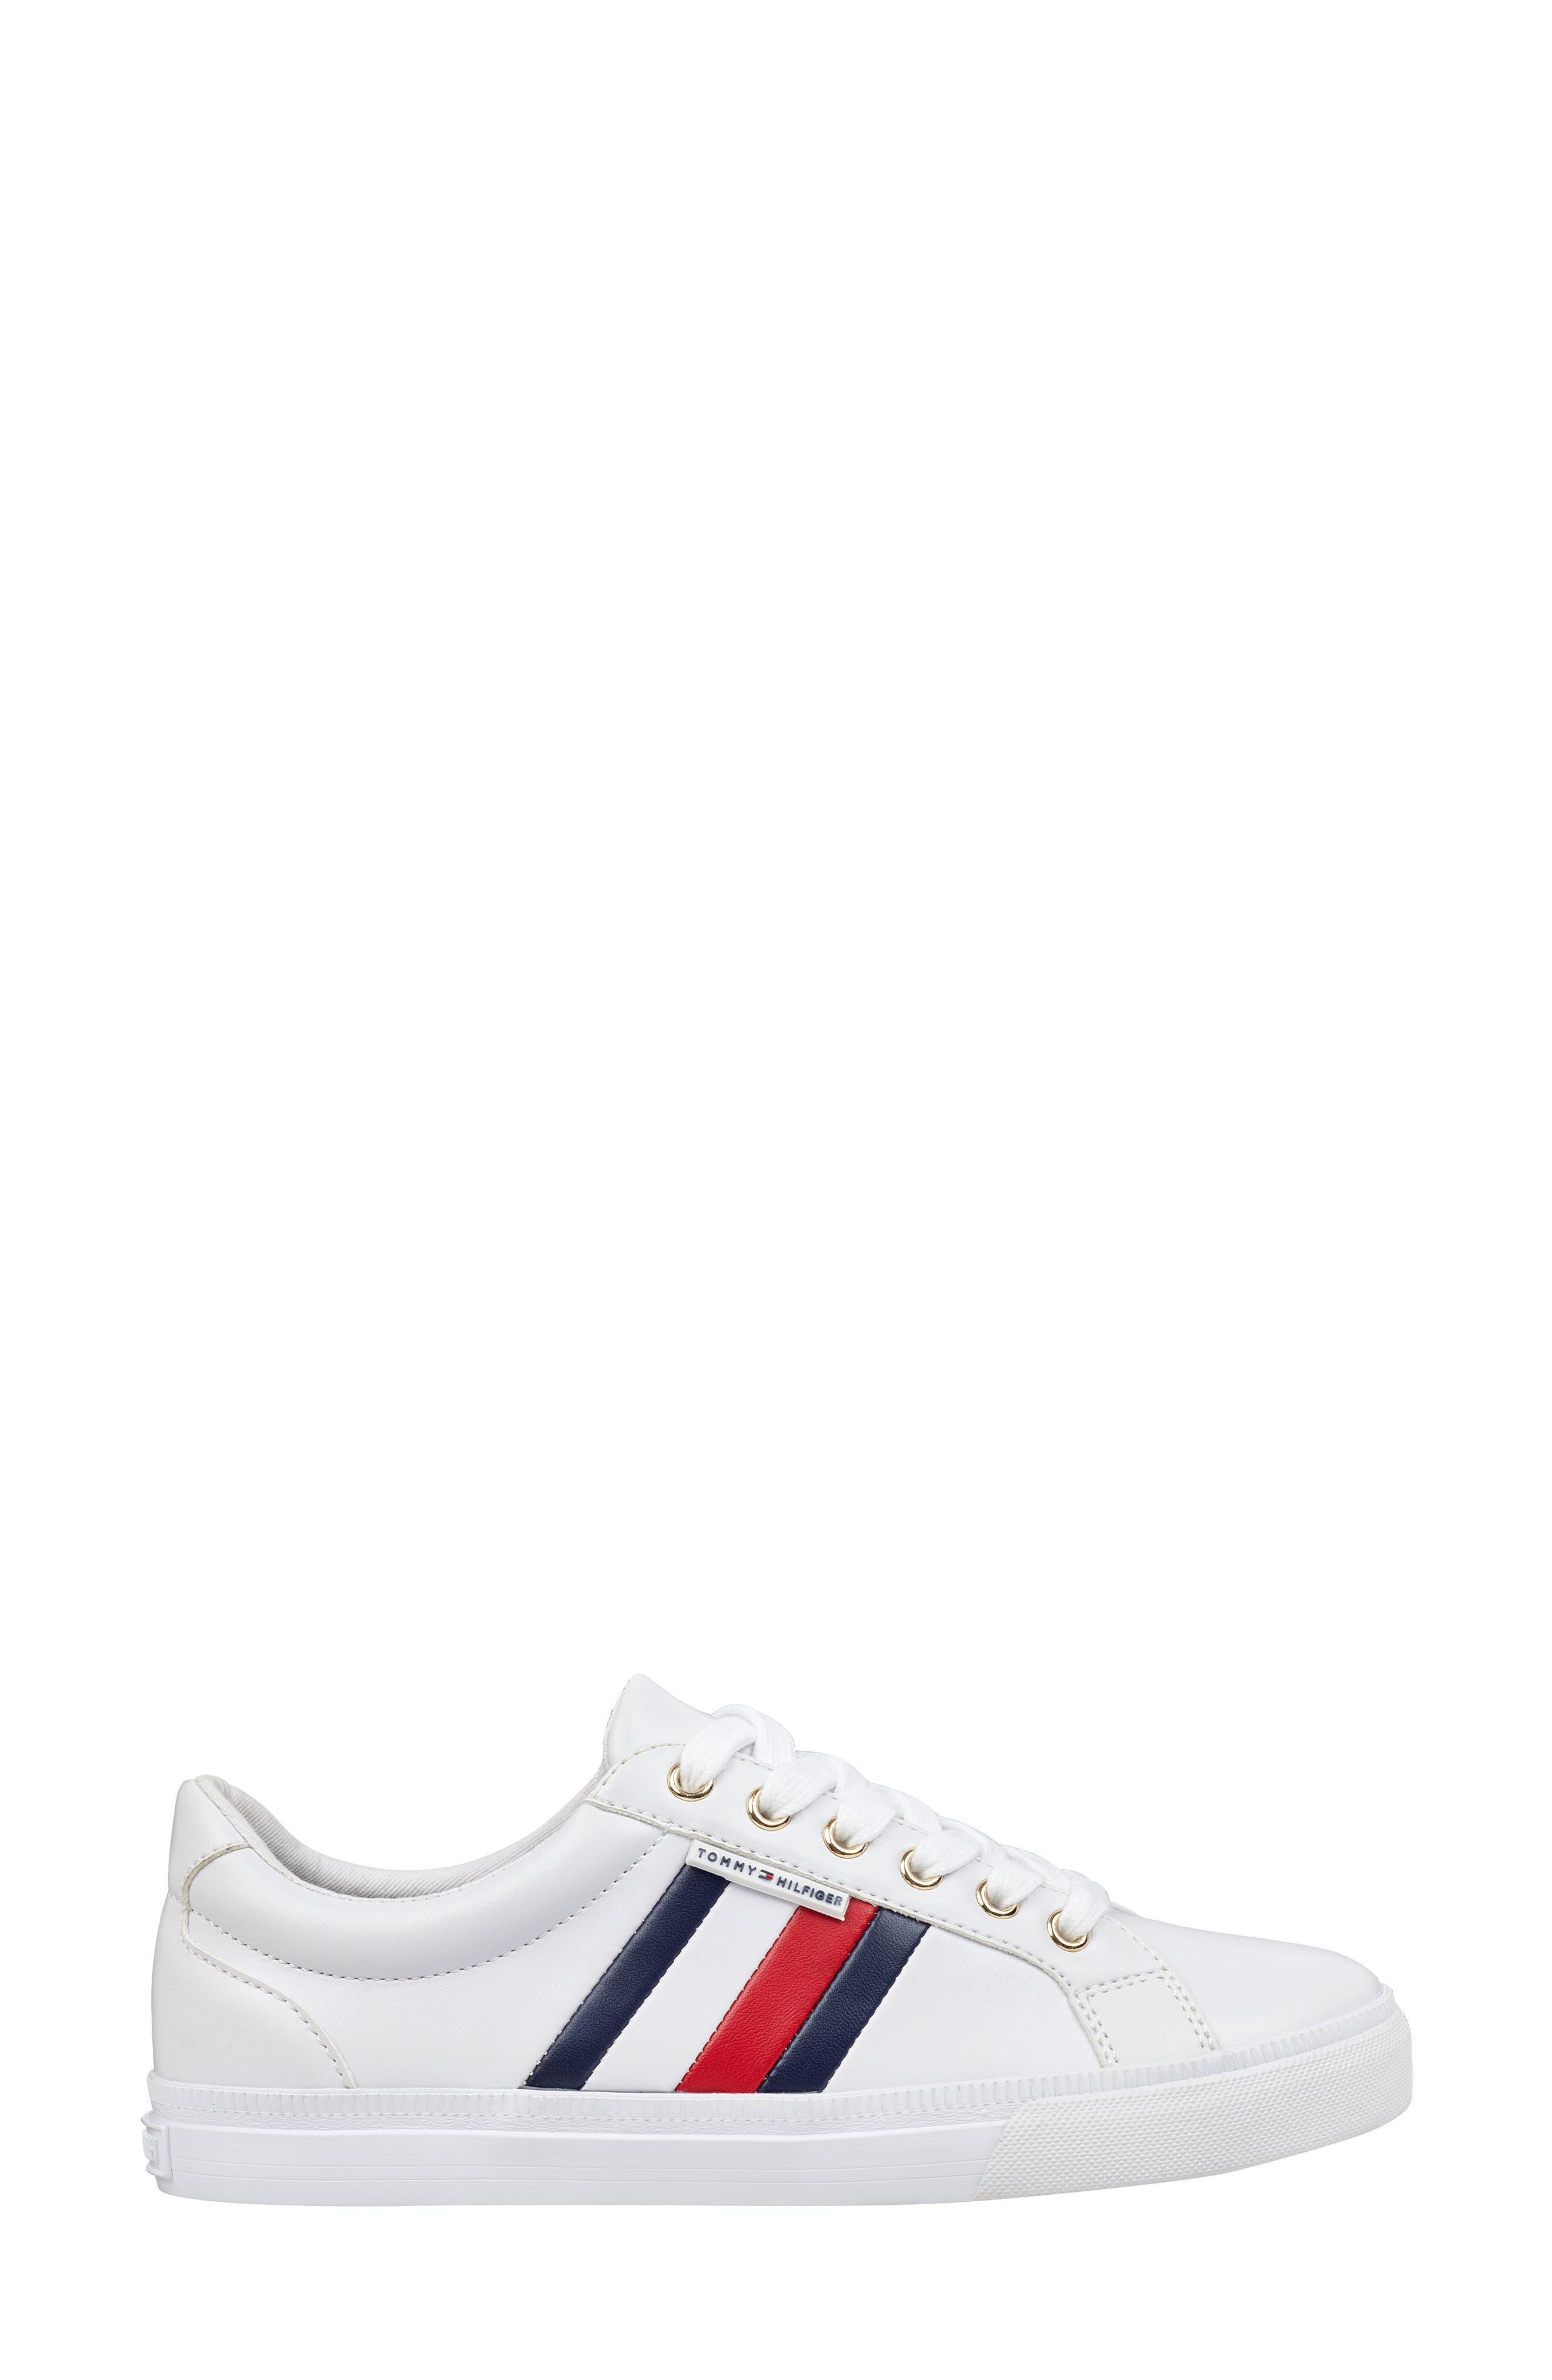 Tommy Hilfiger Lightz Sneaker (Women